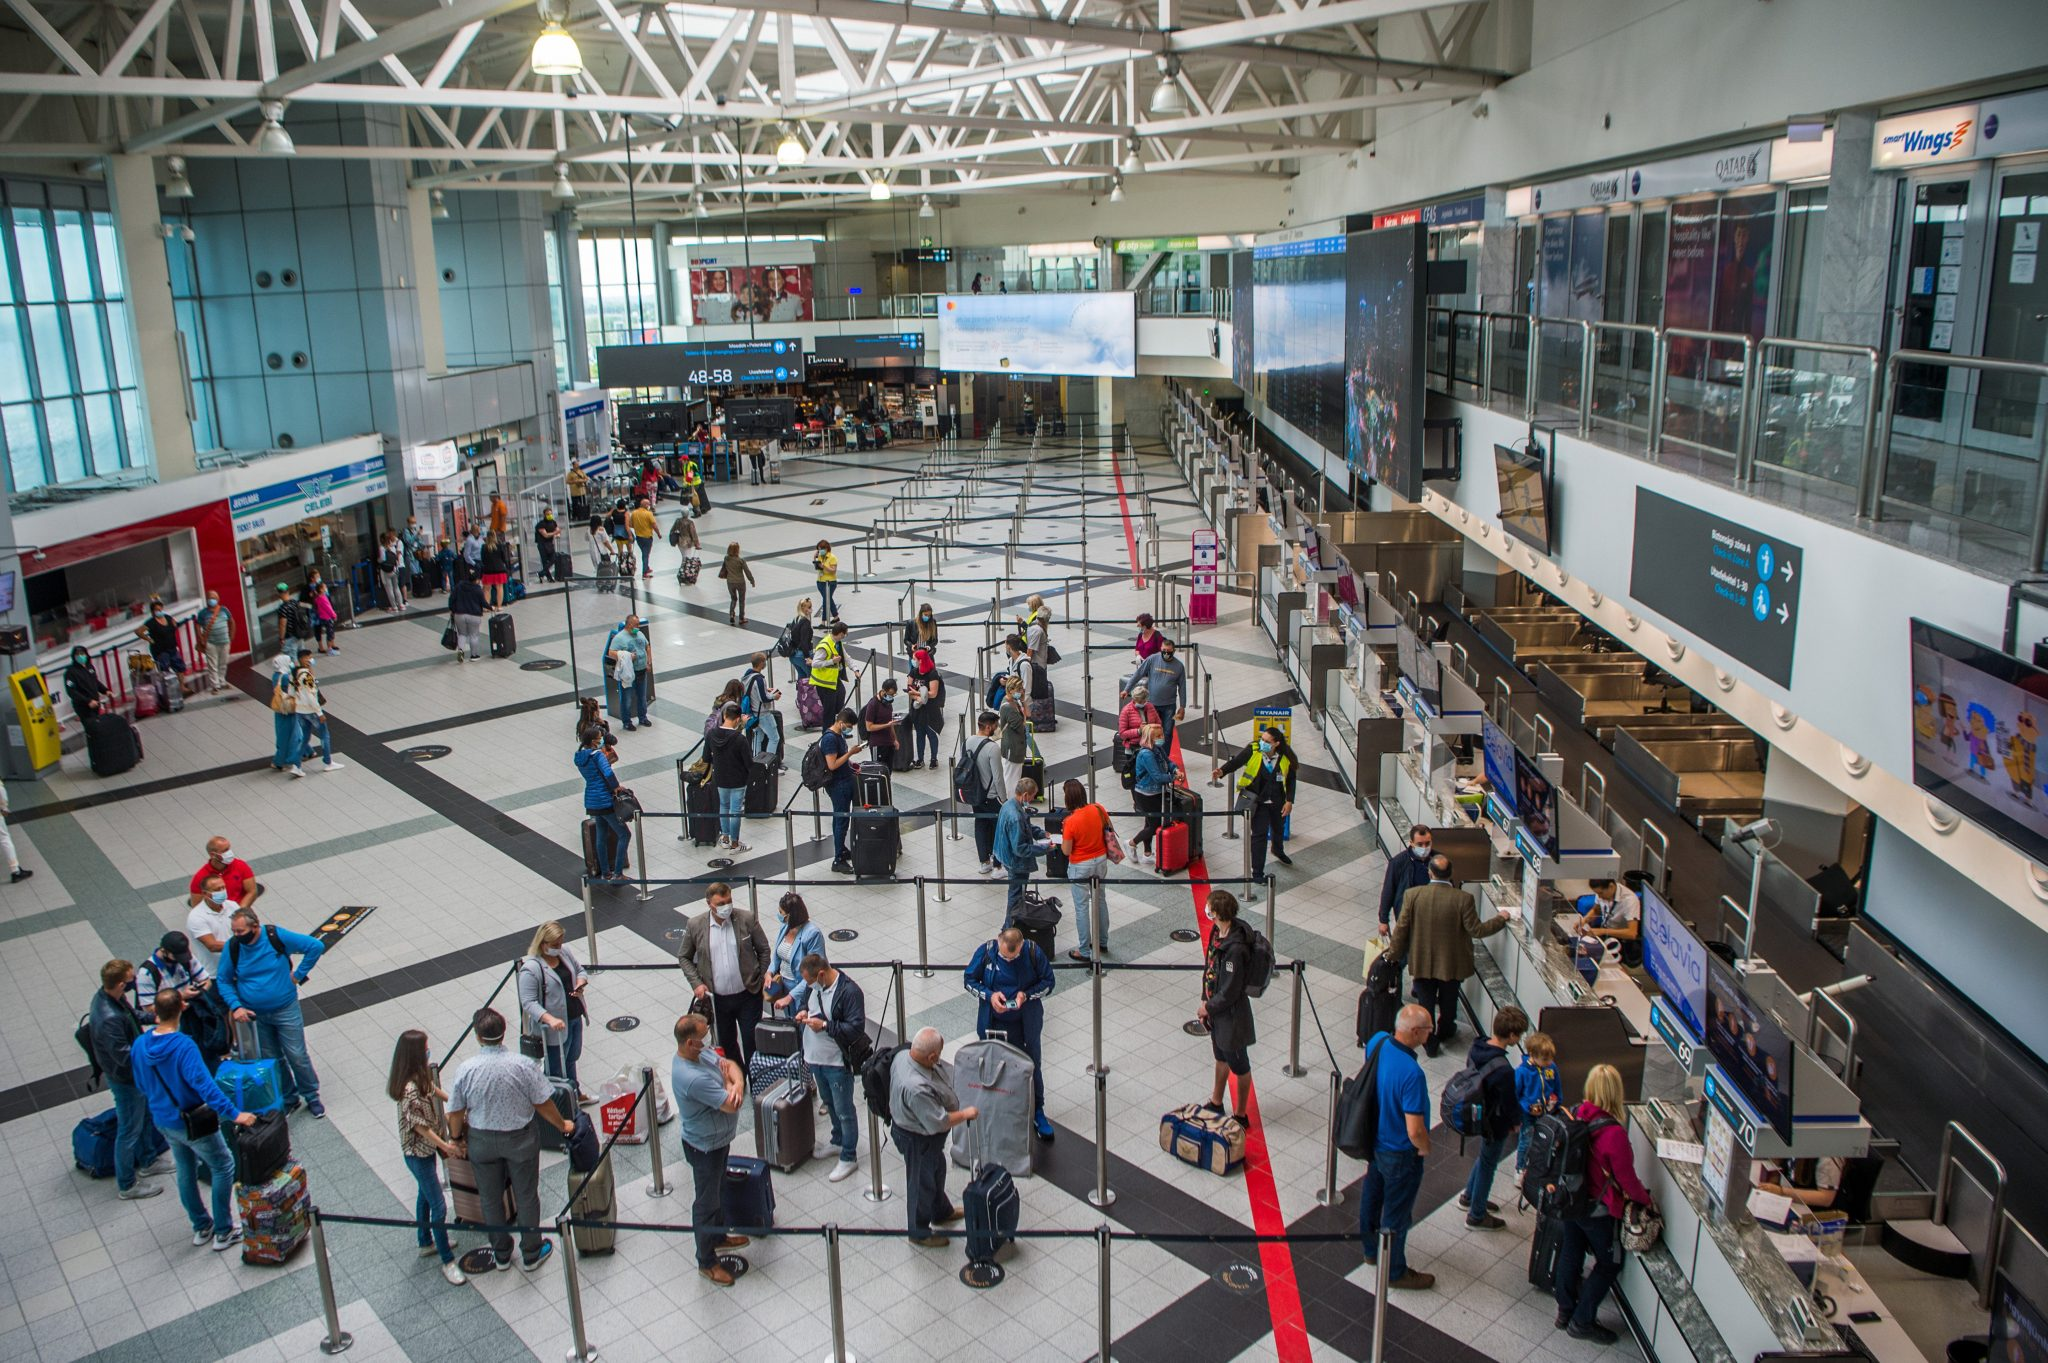 Drittes Terminal am Budapester Flughafen geplant